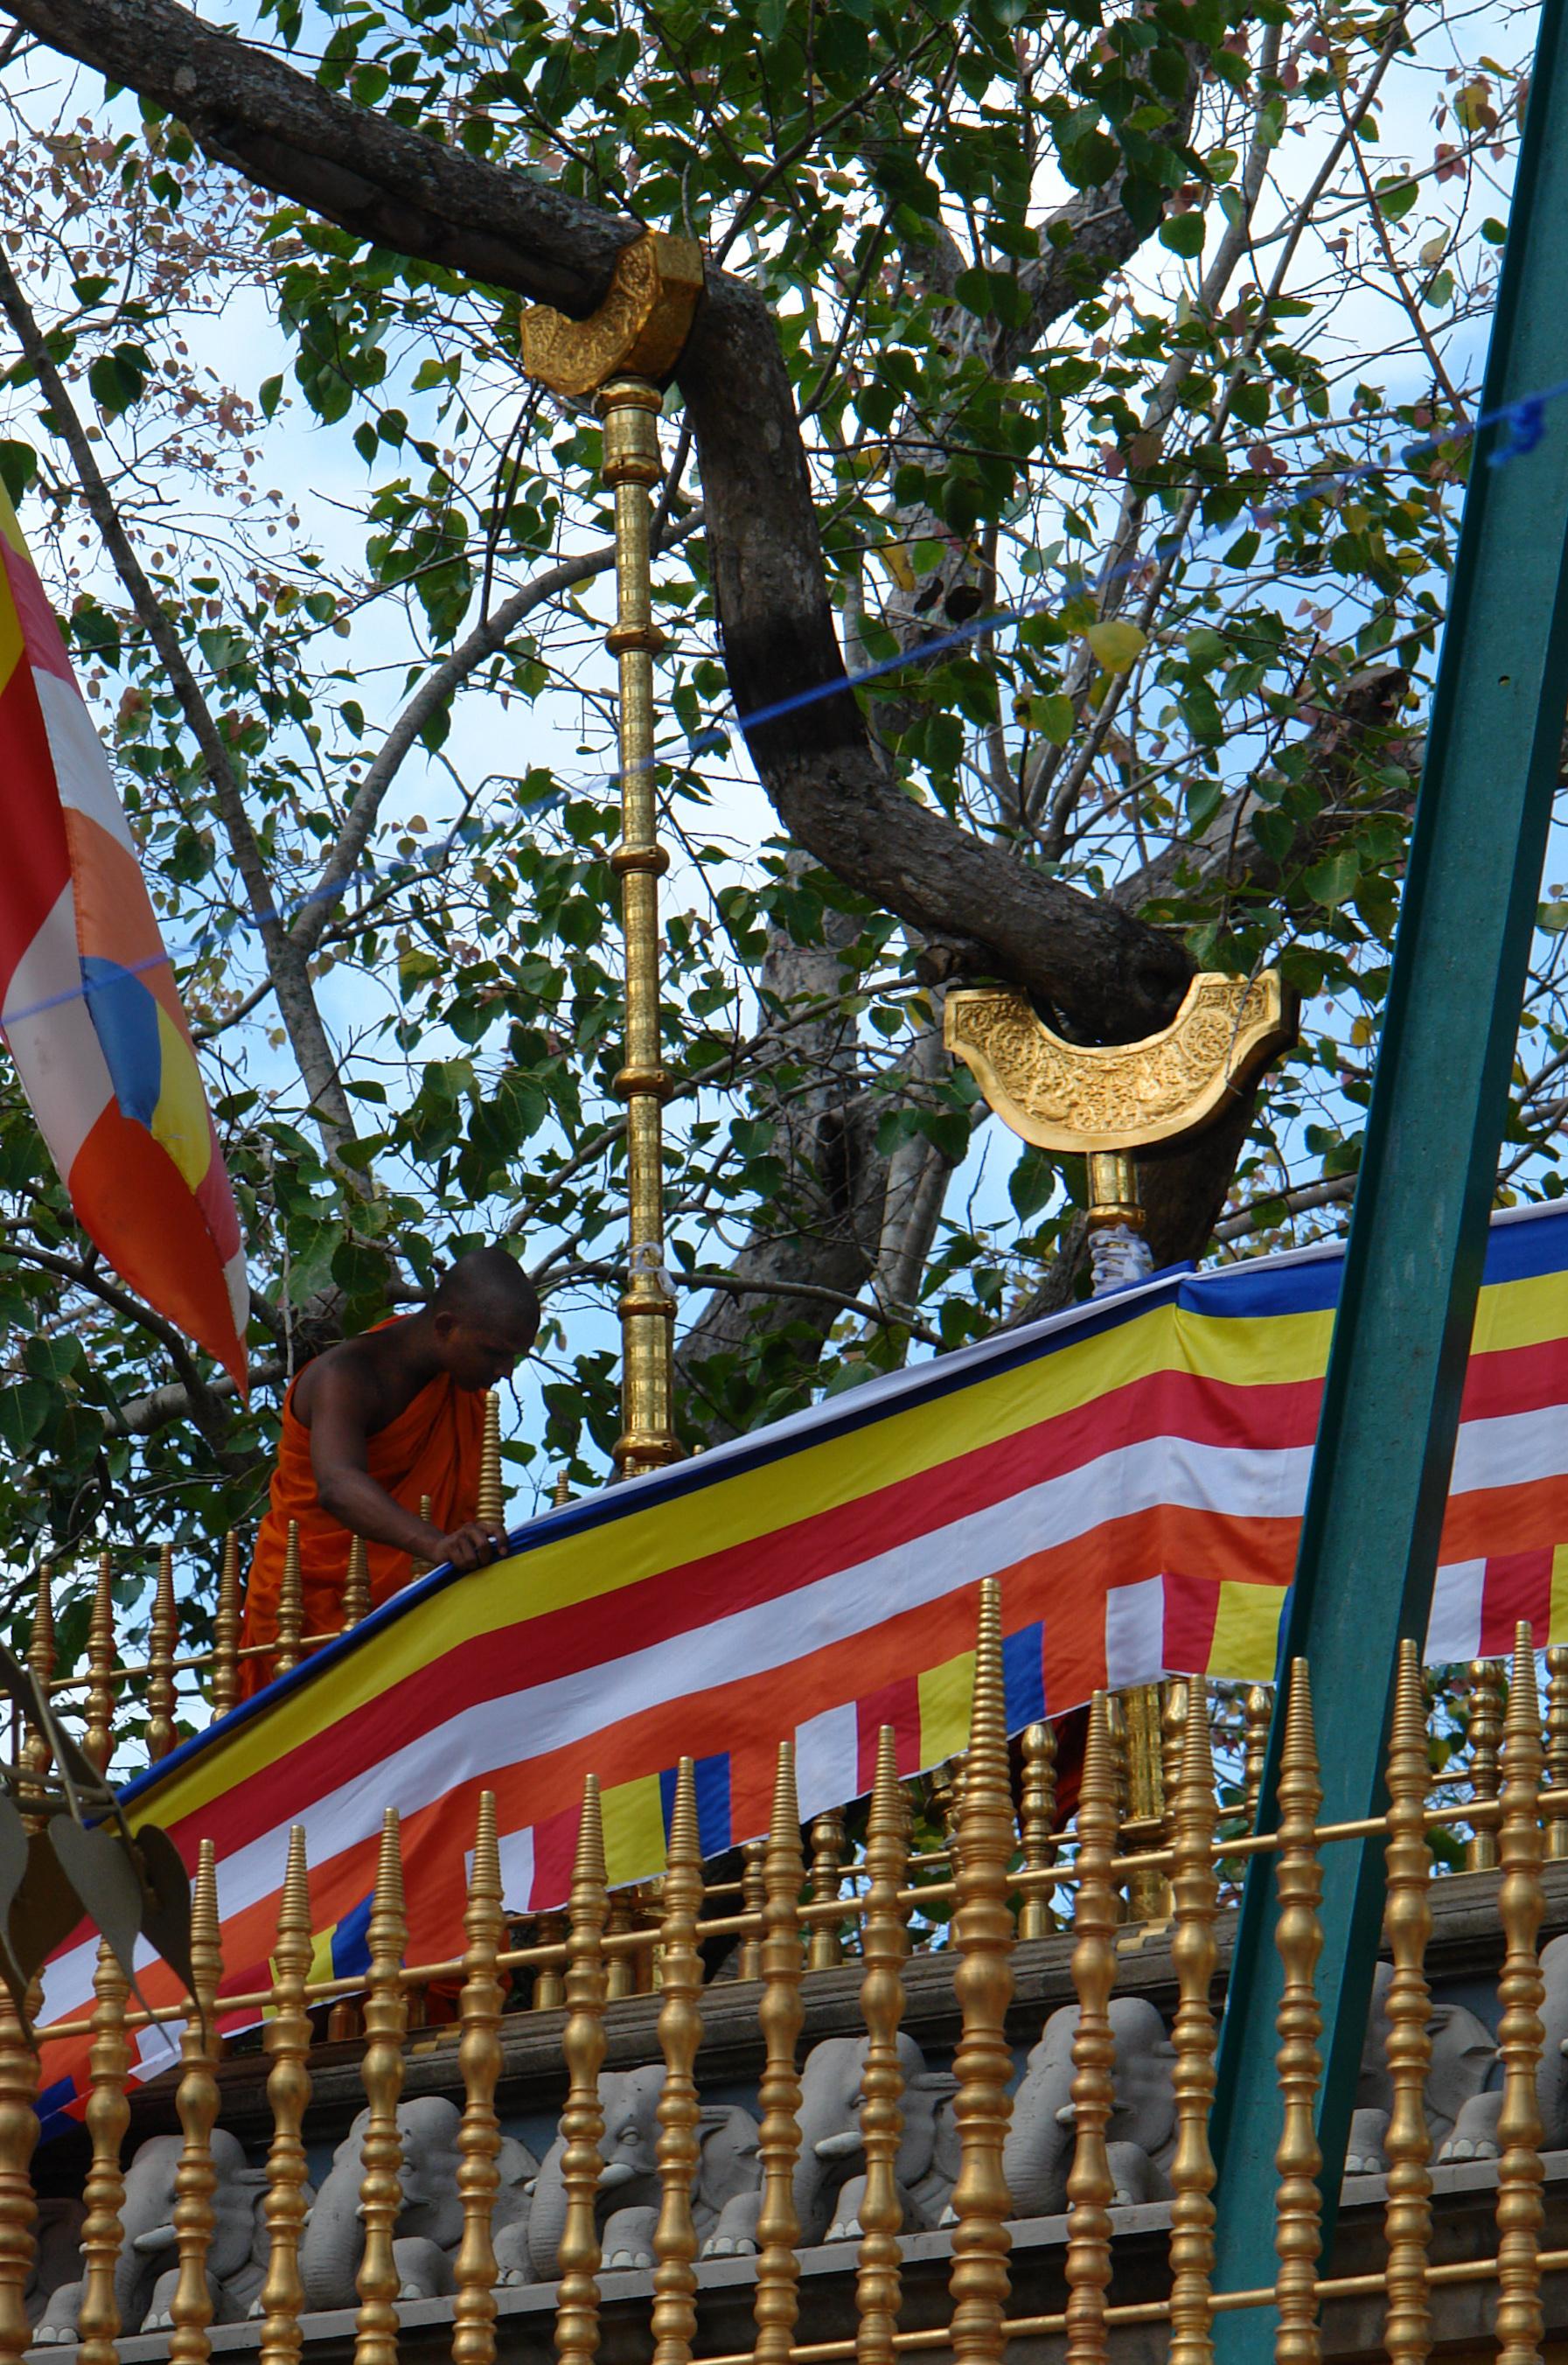 A Voyage Through Time - the photo of the Jaya Sri Maha Bodhi sacred fig tree in Sri Lanka